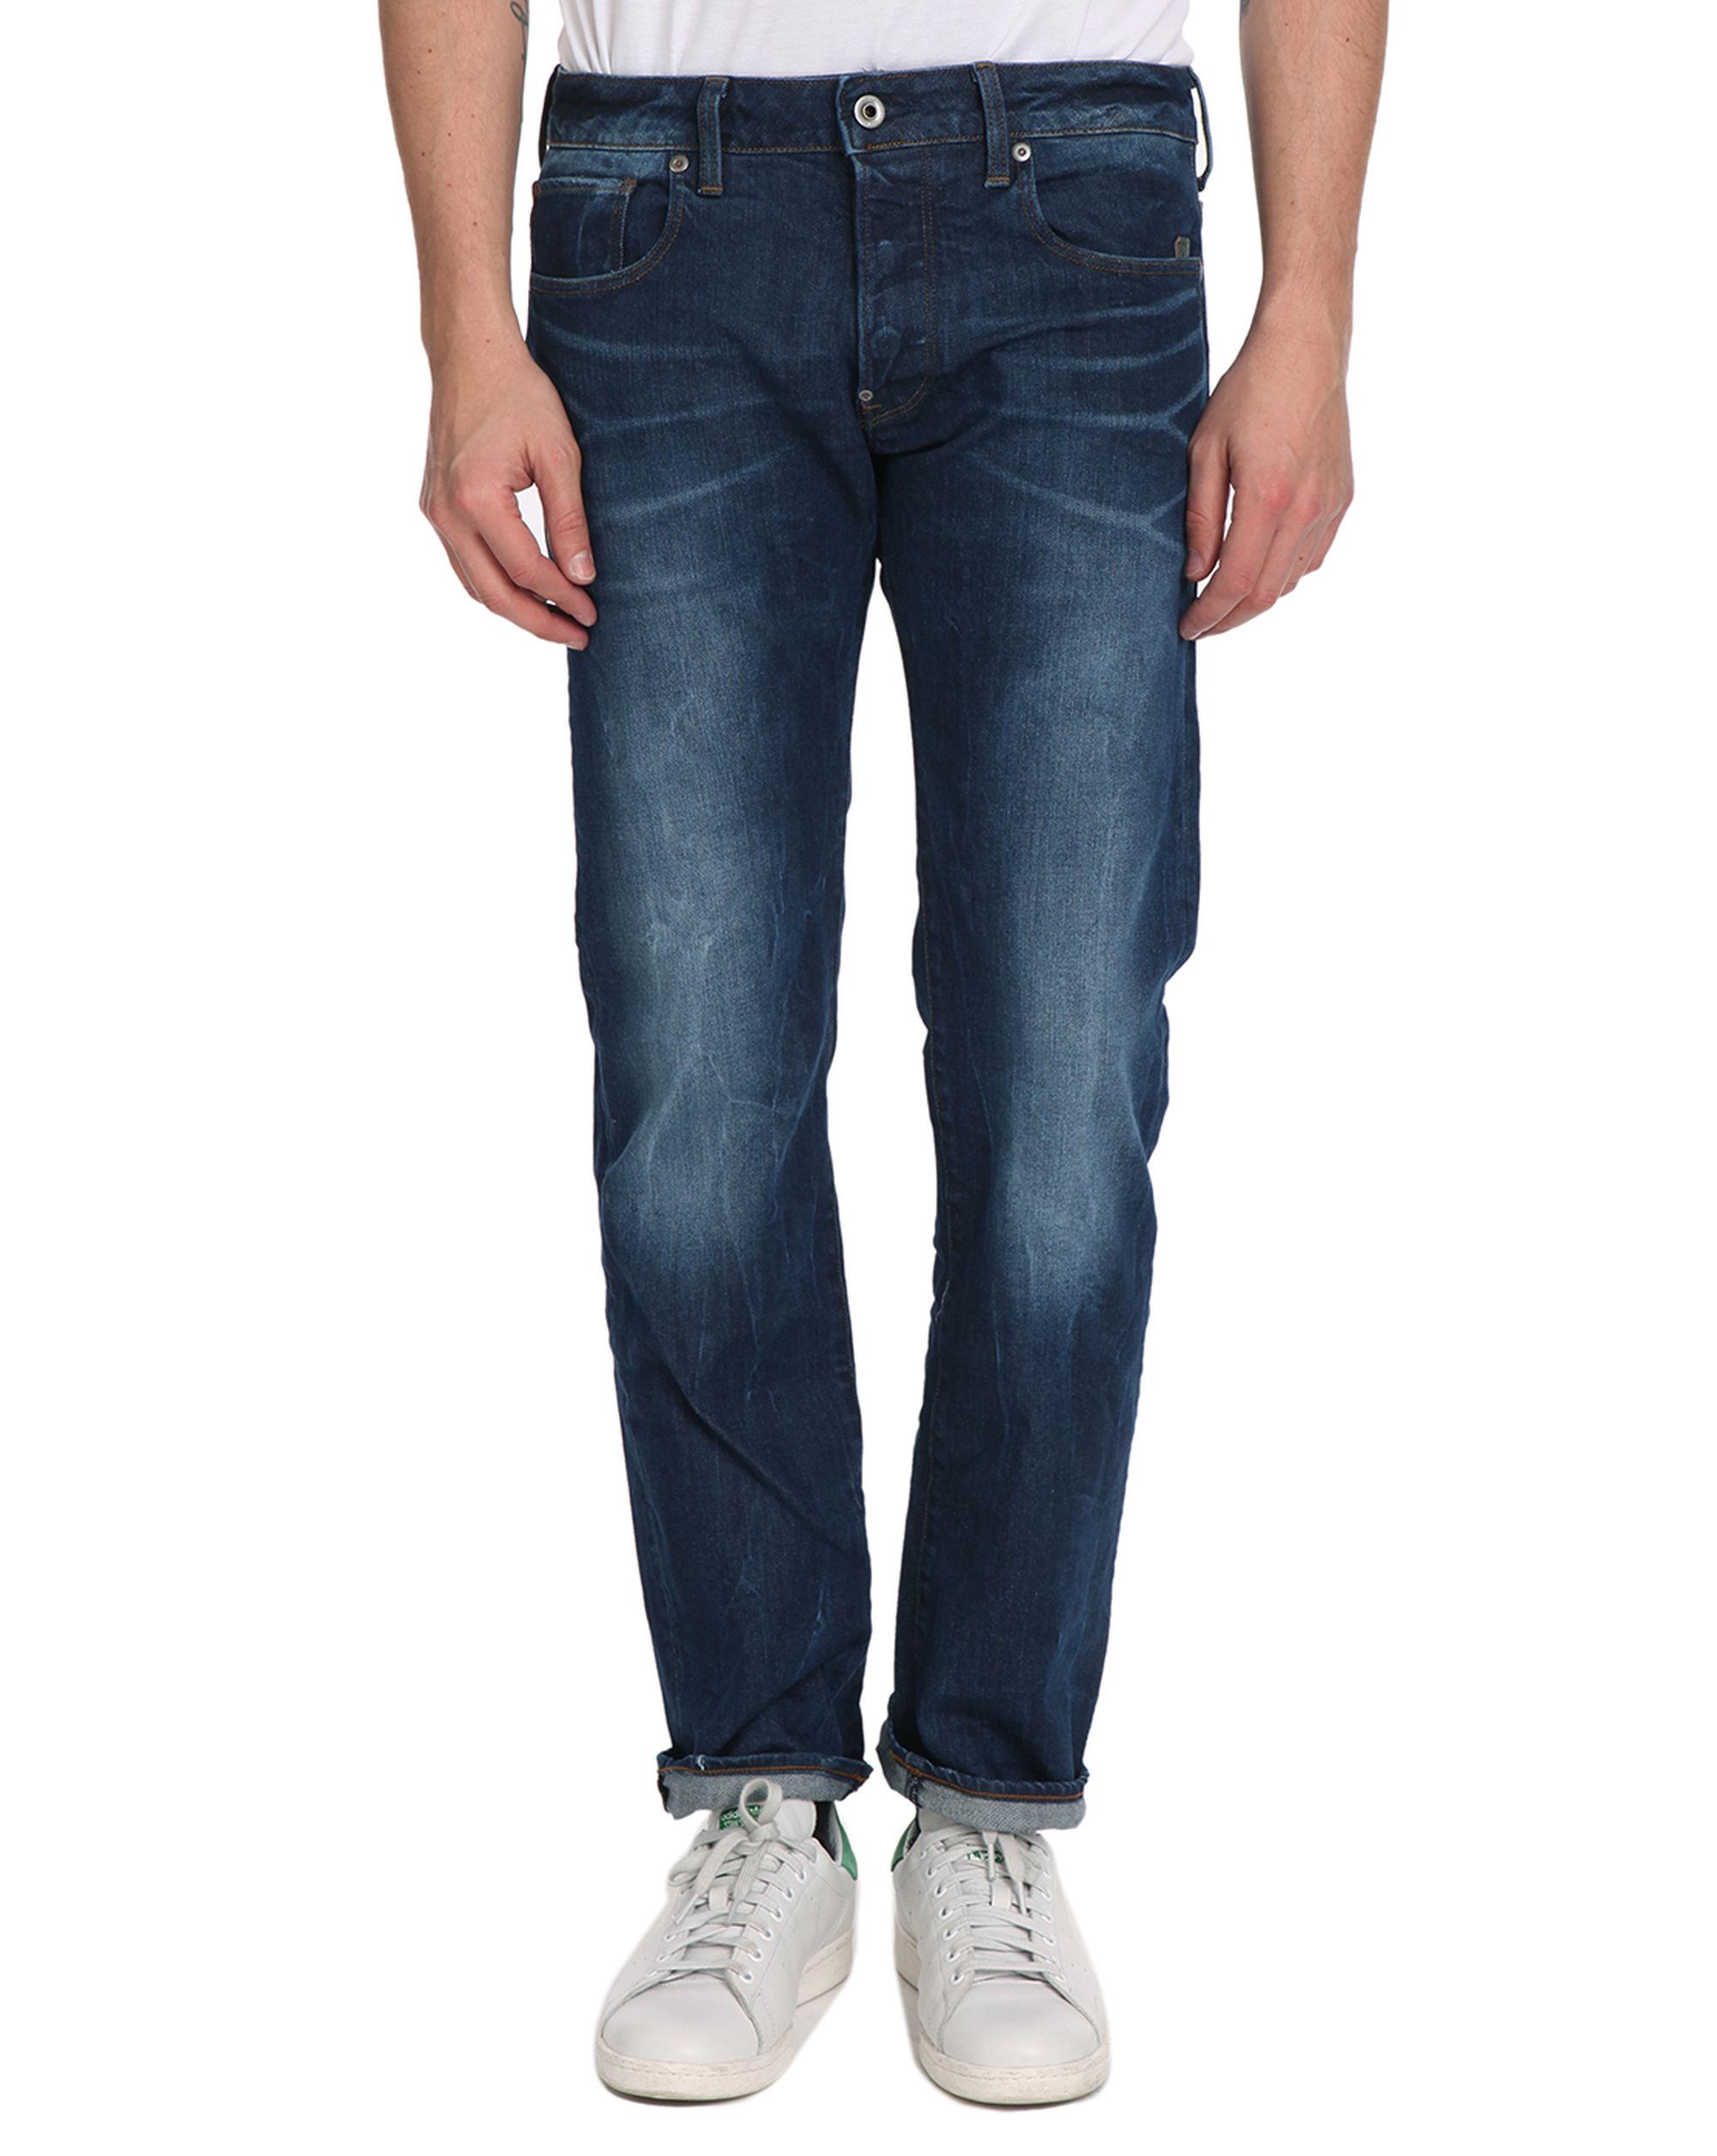 g star raw arc 3d faded slim blue jeans in blue for men lyst. Black Bedroom Furniture Sets. Home Design Ideas